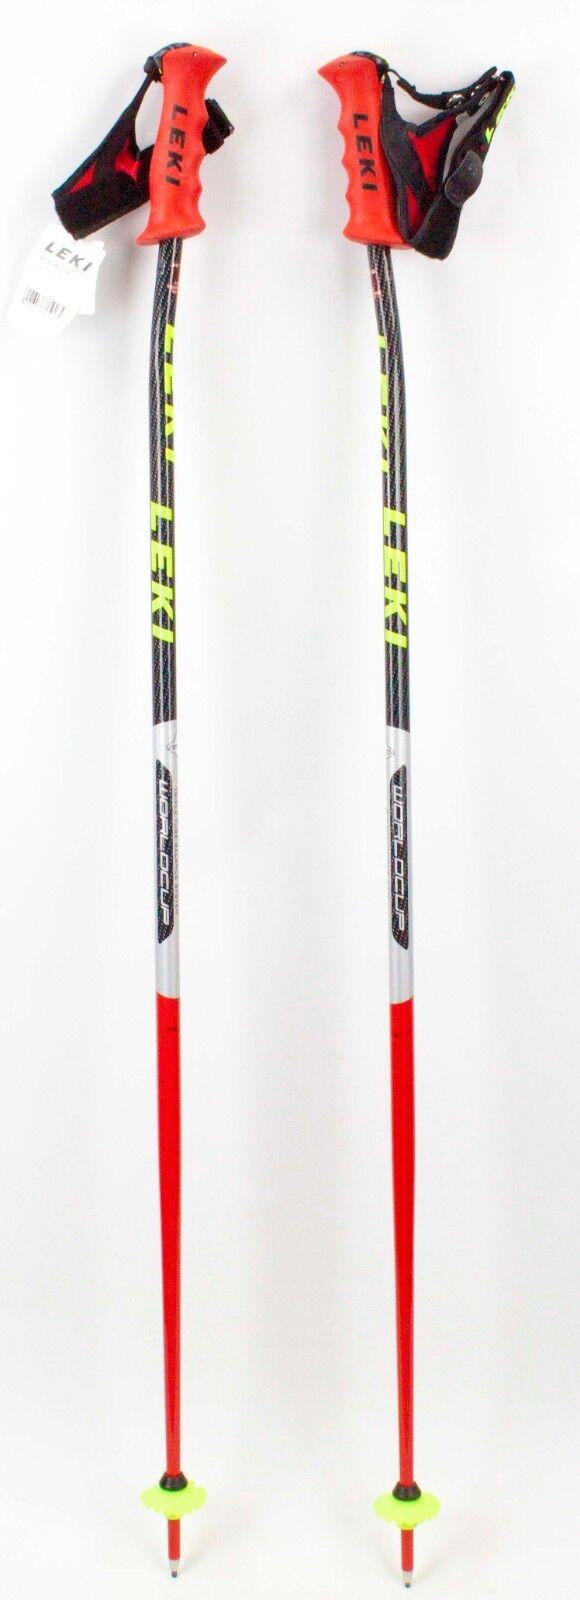 NEW   250 LEKI World Cup Racing Ski Poles 130CM 52  Downhill Skiing Carbon  fashion mall